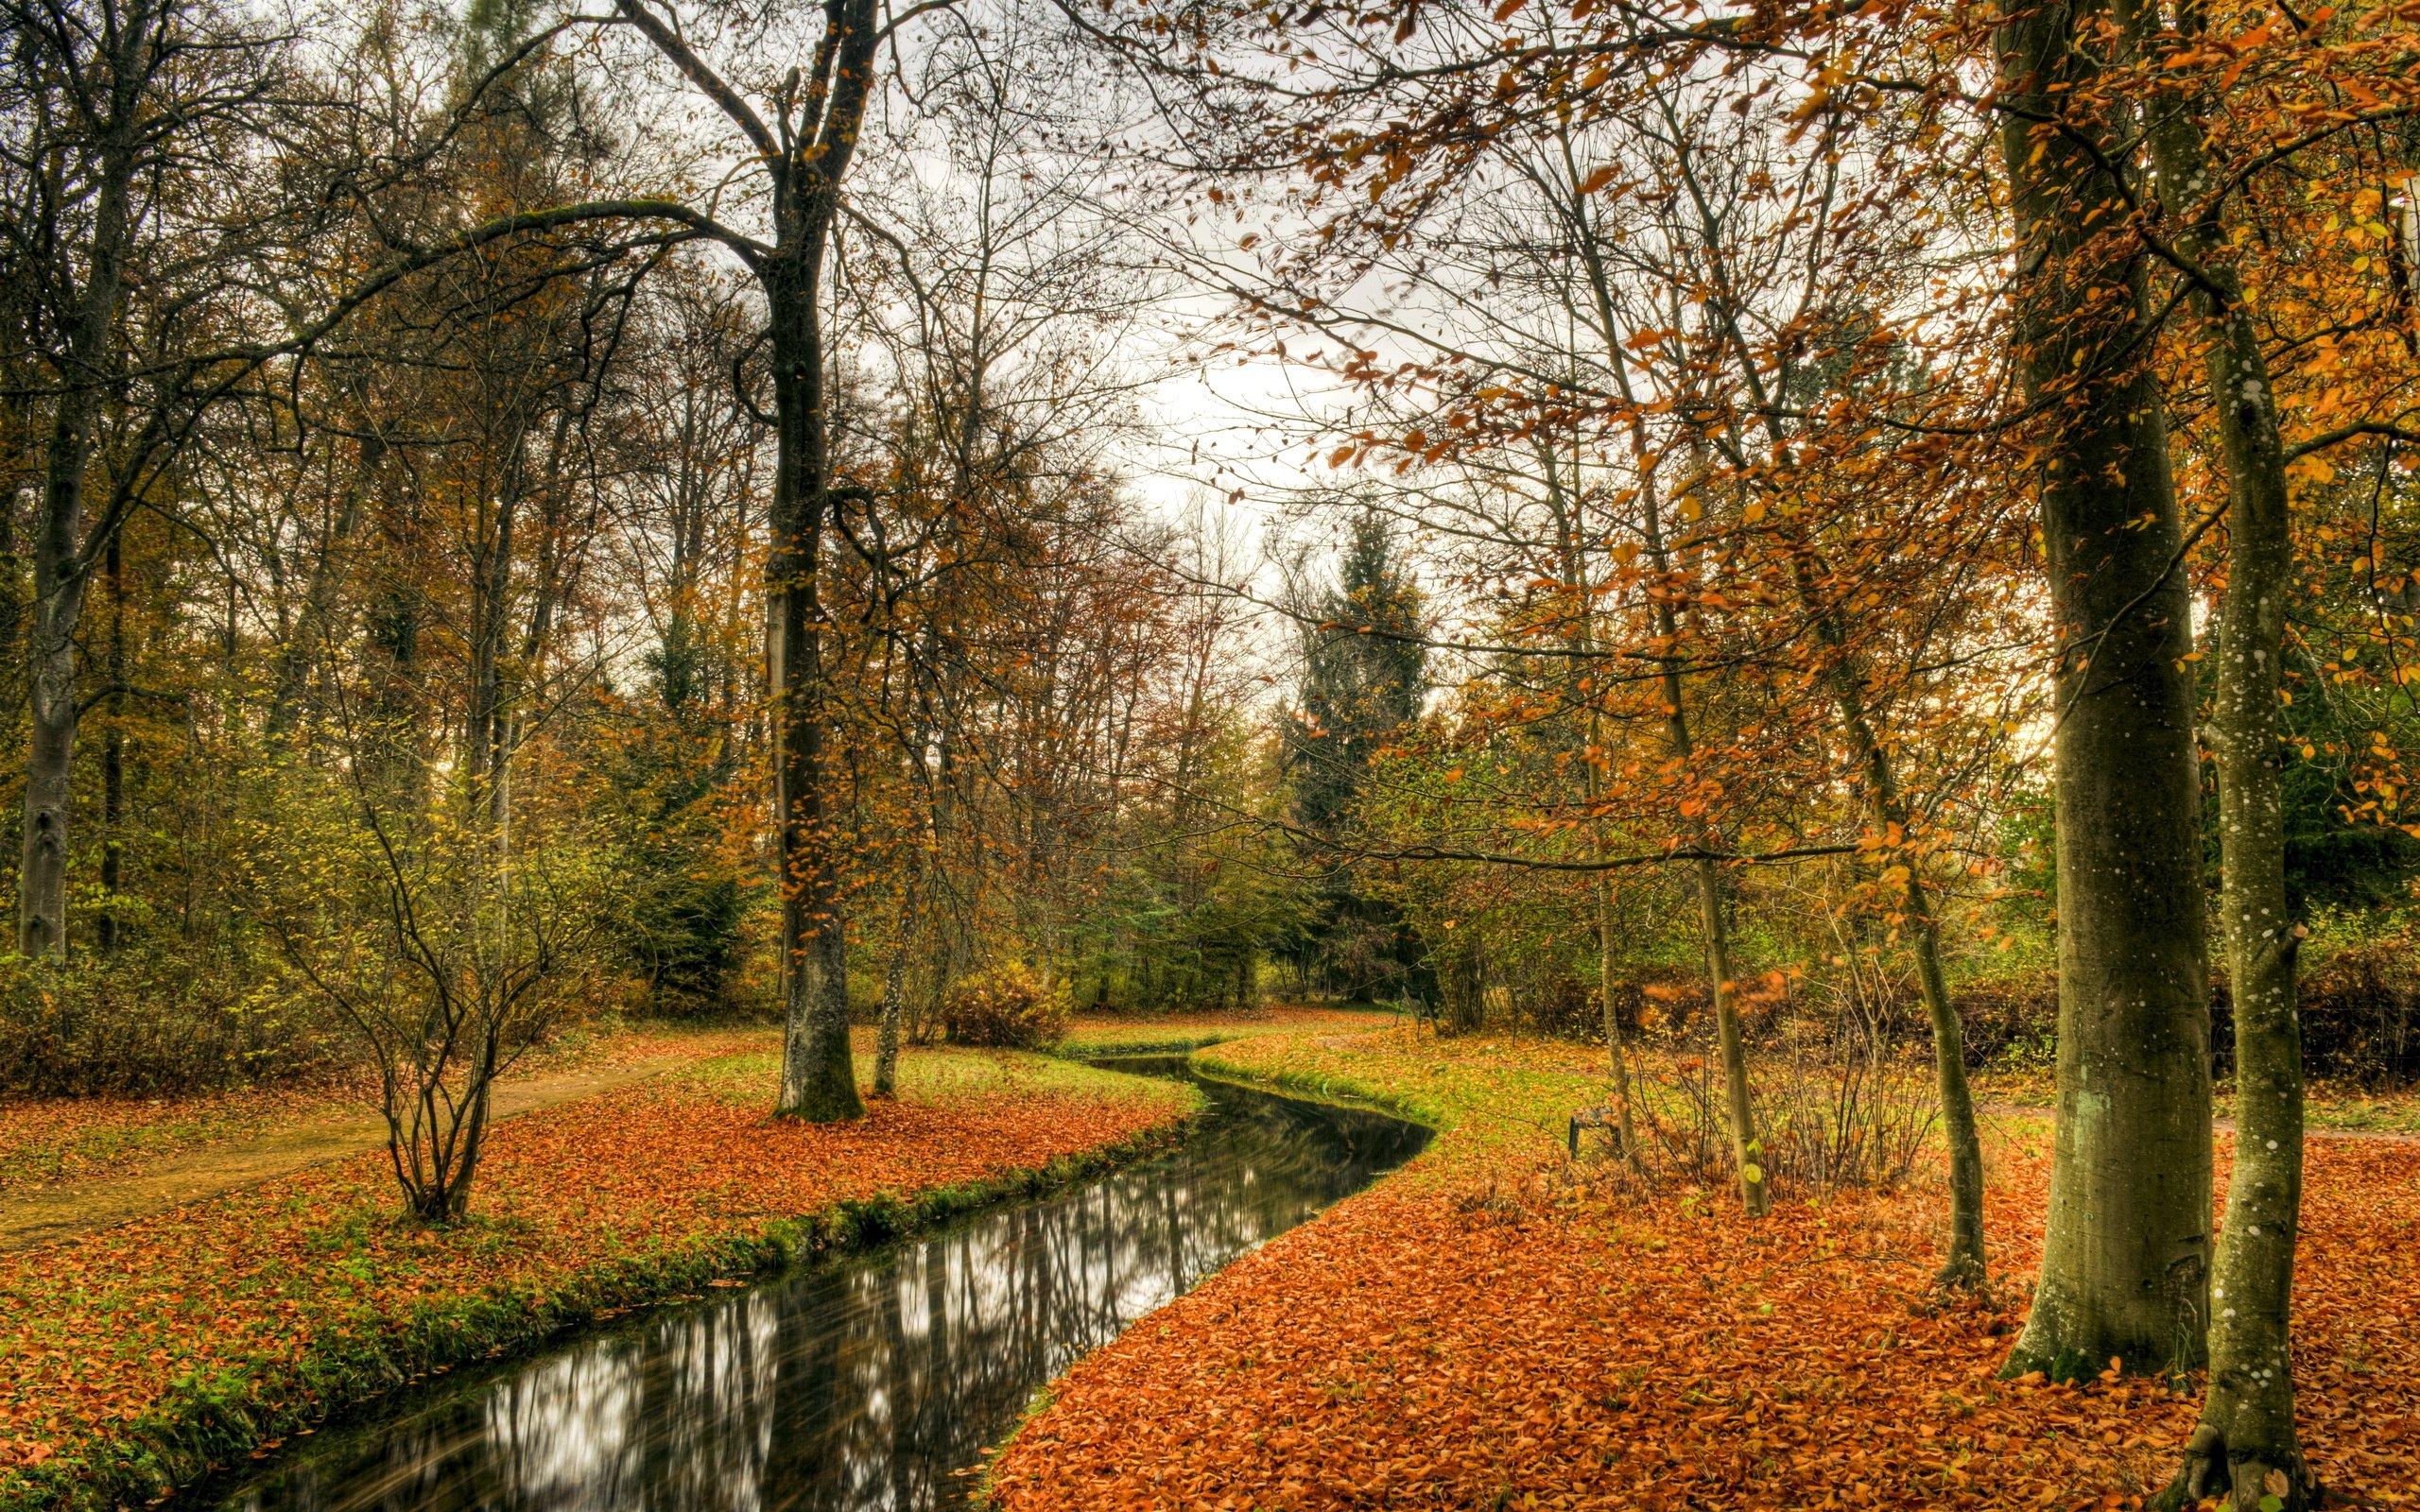 latvian autumn forest river - photo #11